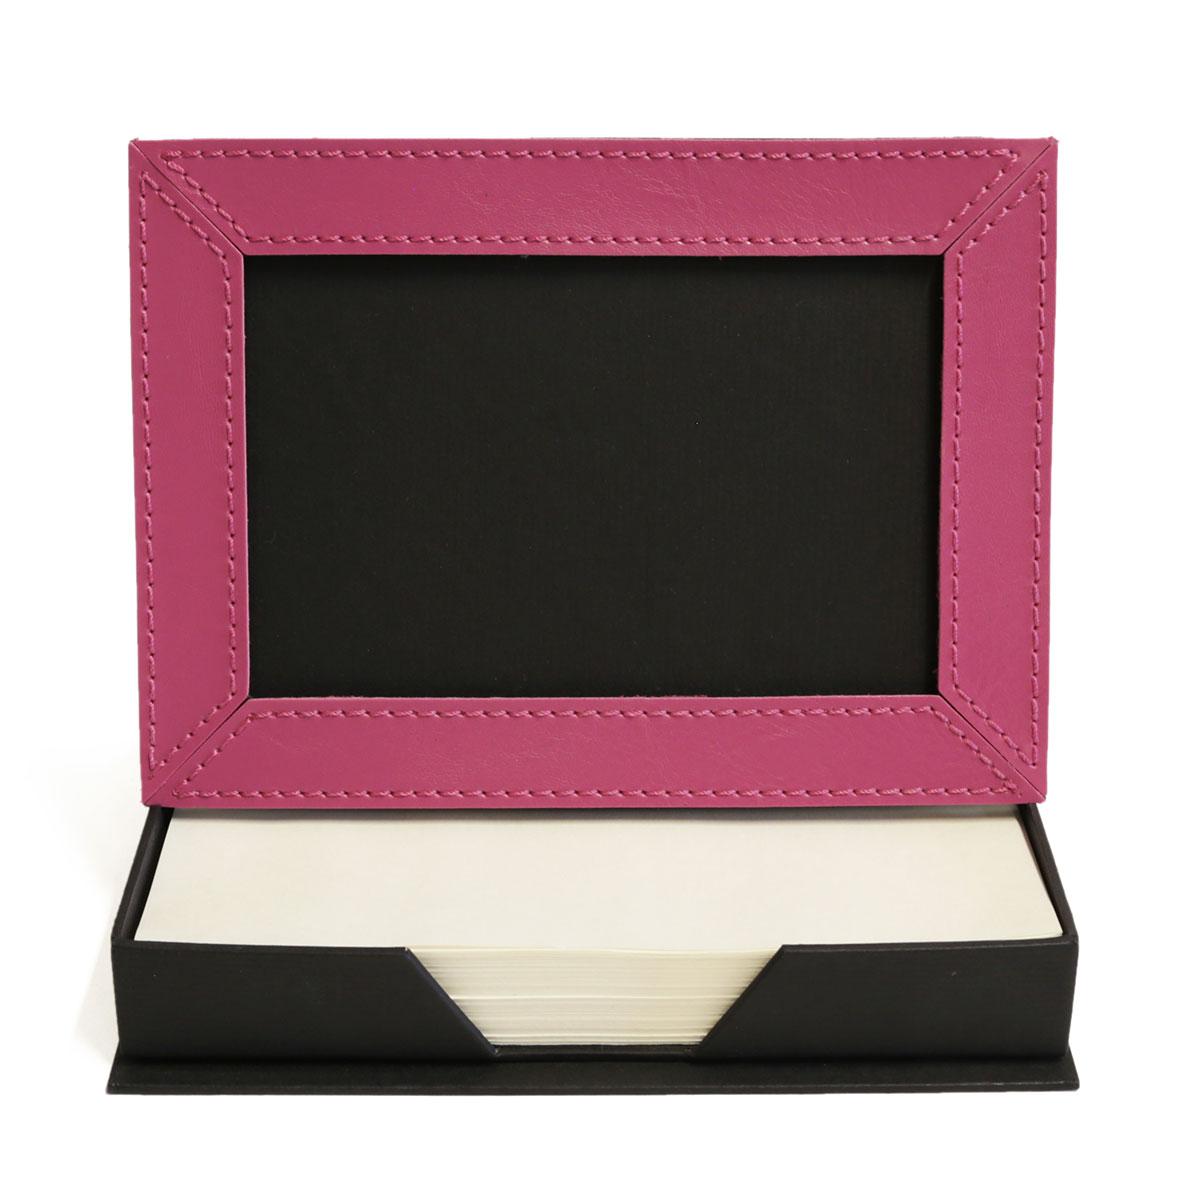 Caixa porta retrato (Montana Pink)